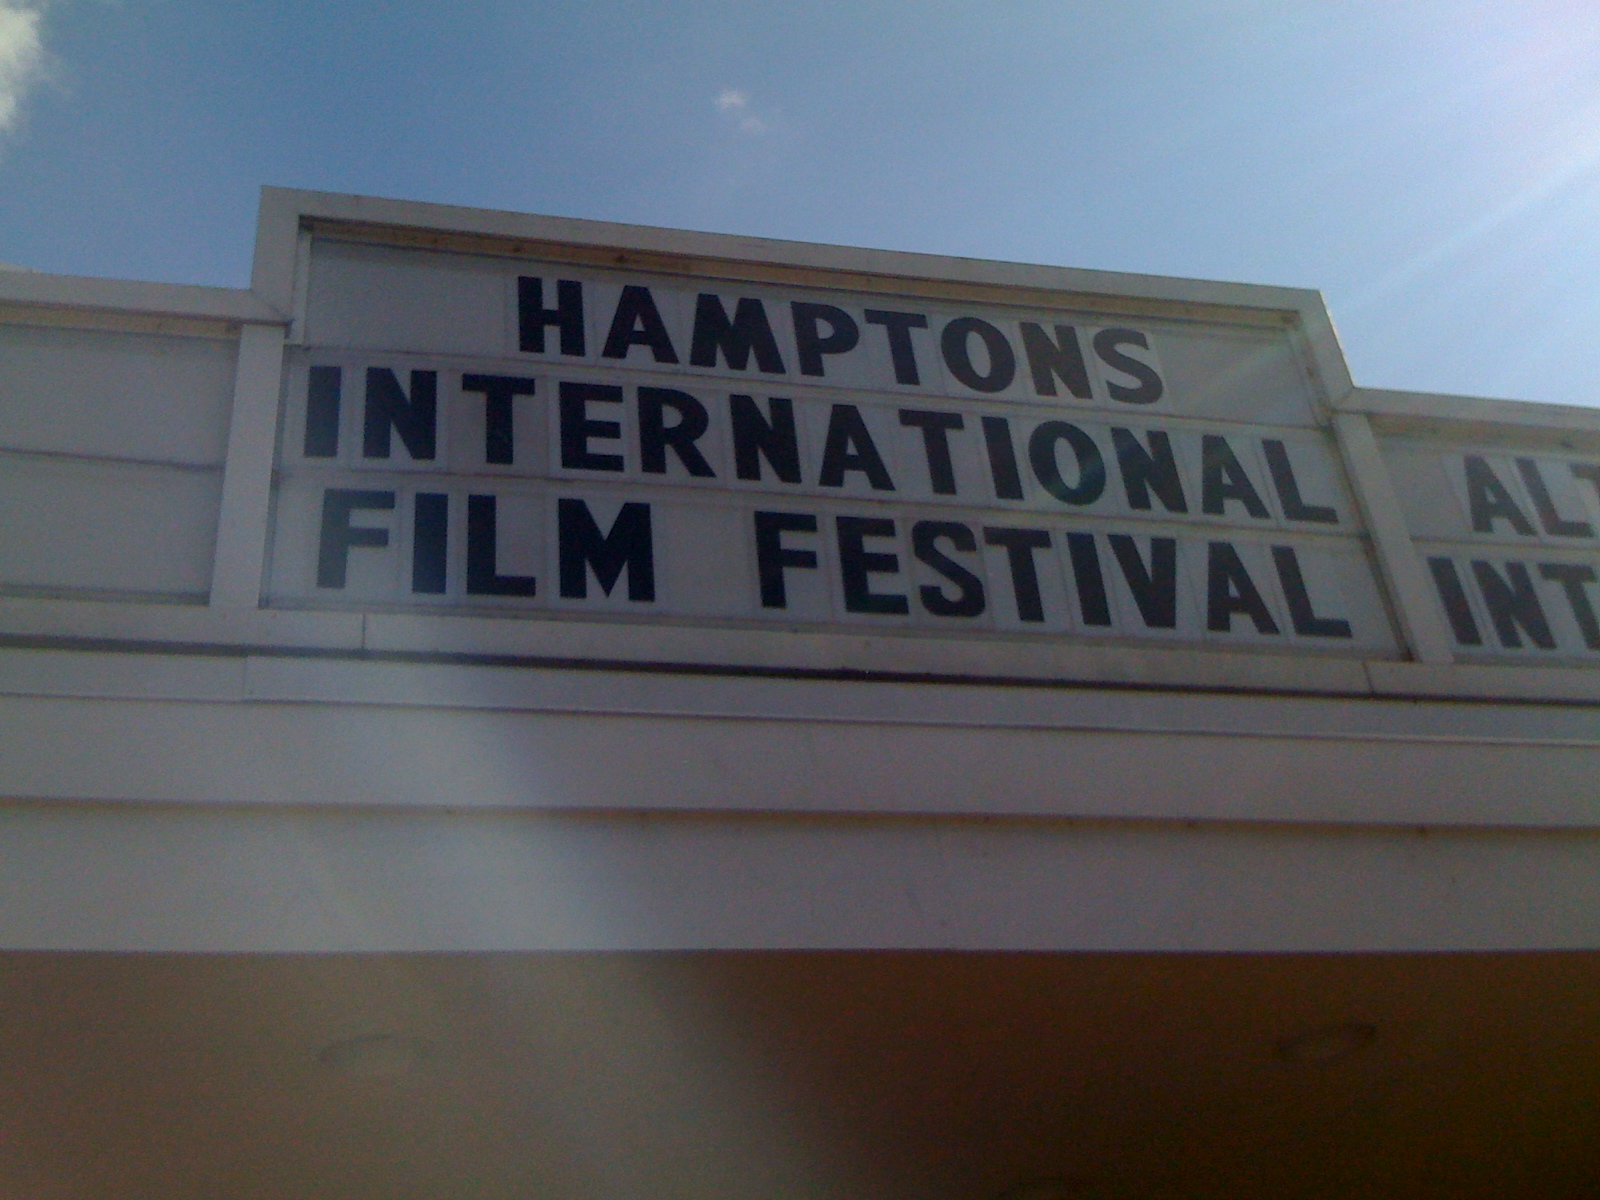 Hamptons International Film Festival 2009